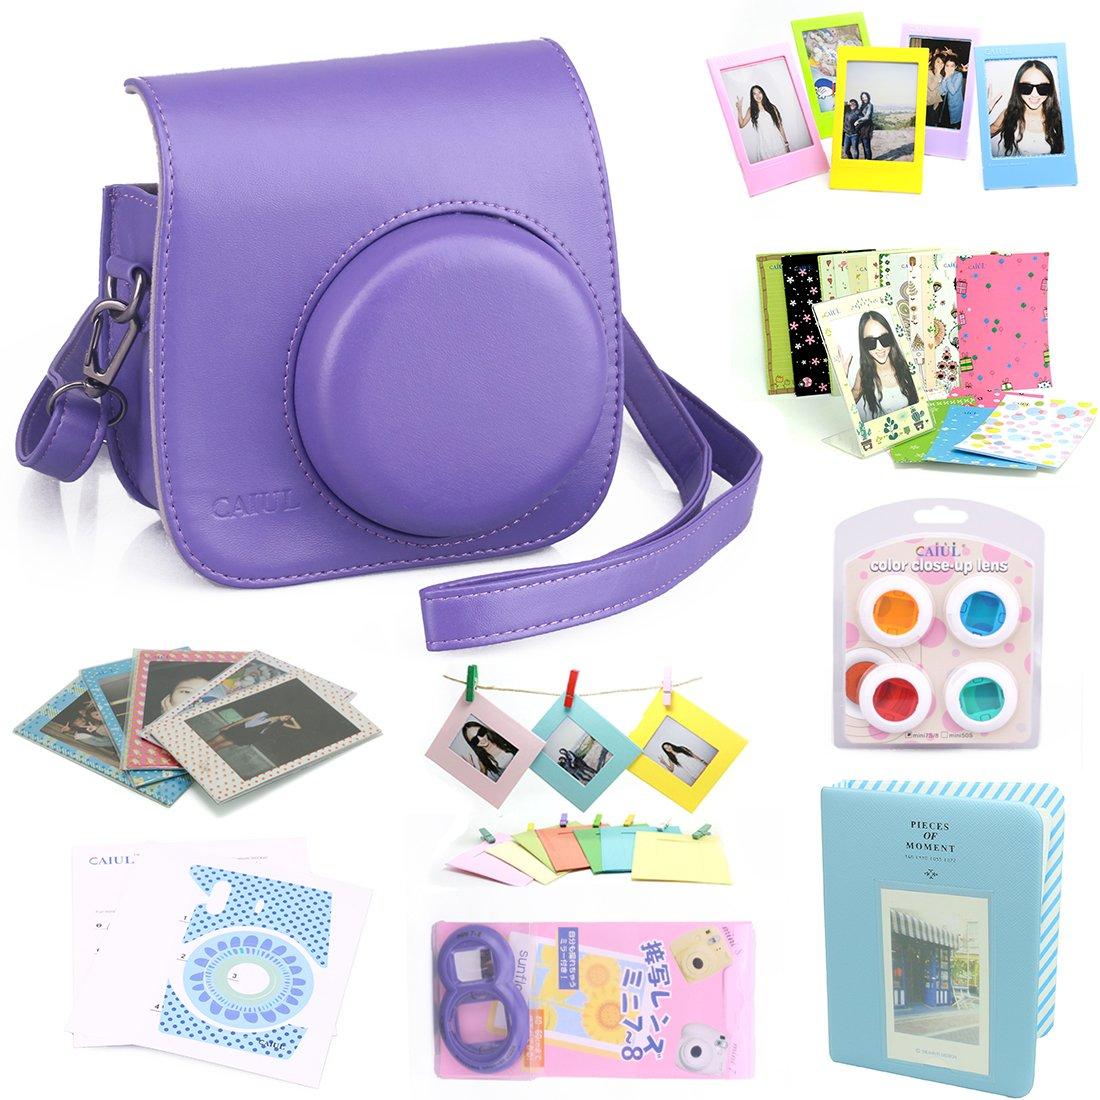 CAIUL 9 in 1 Fujifilm Instax Mini 8 Accessories Bundle (Purple Mini 8 Case/Mini Album/selfie Lens/4 colors Close-Up Lens/Film Frame/Wall Hang Frame/Film Protective Pouch/Film & Camera Sticker)